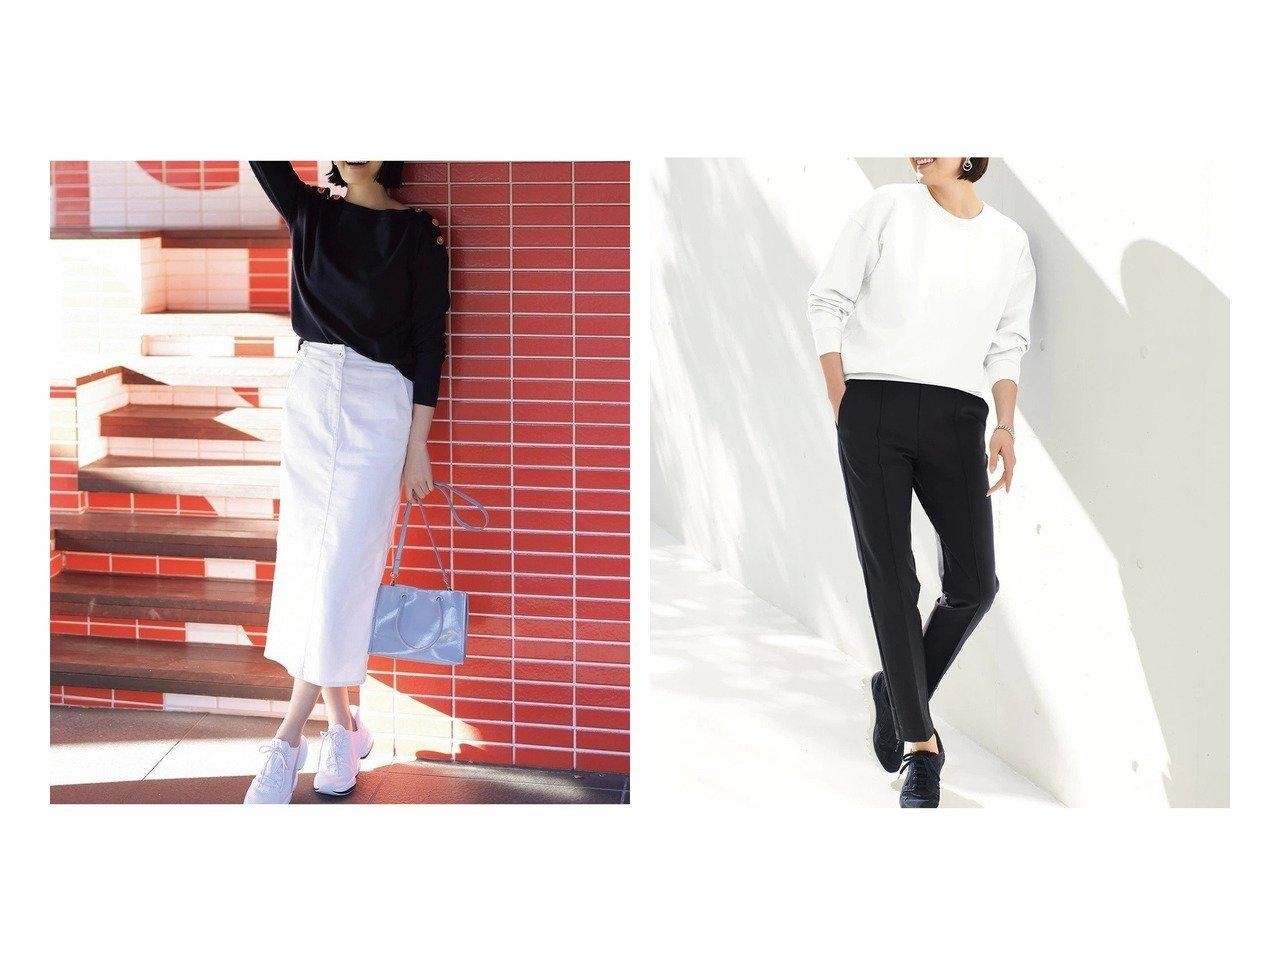 【DoCLASSE/ドゥクラッセ】の甘撚りエアーデニム・ストレートスカート&接結ストレッチ・フォルムトップス 40代、50代の女性におすすめ!人気トレンド・ファッションの通販 おすすめで人気の流行・トレンド、ファッションの通販商品 メンズファッション・キッズファッション・インテリア・家具・レディースファッション・服の通販 founy(ファニー) https://founy.com/ ファッション Fashion レディースファッション WOMEN スカート Skirt トップス・カットソー Tops/Tshirt ストレート デニム なめらか カッティング ショルダー スウェット スリーブ ドロップ 定番 Standard |ID:crp329100000028113